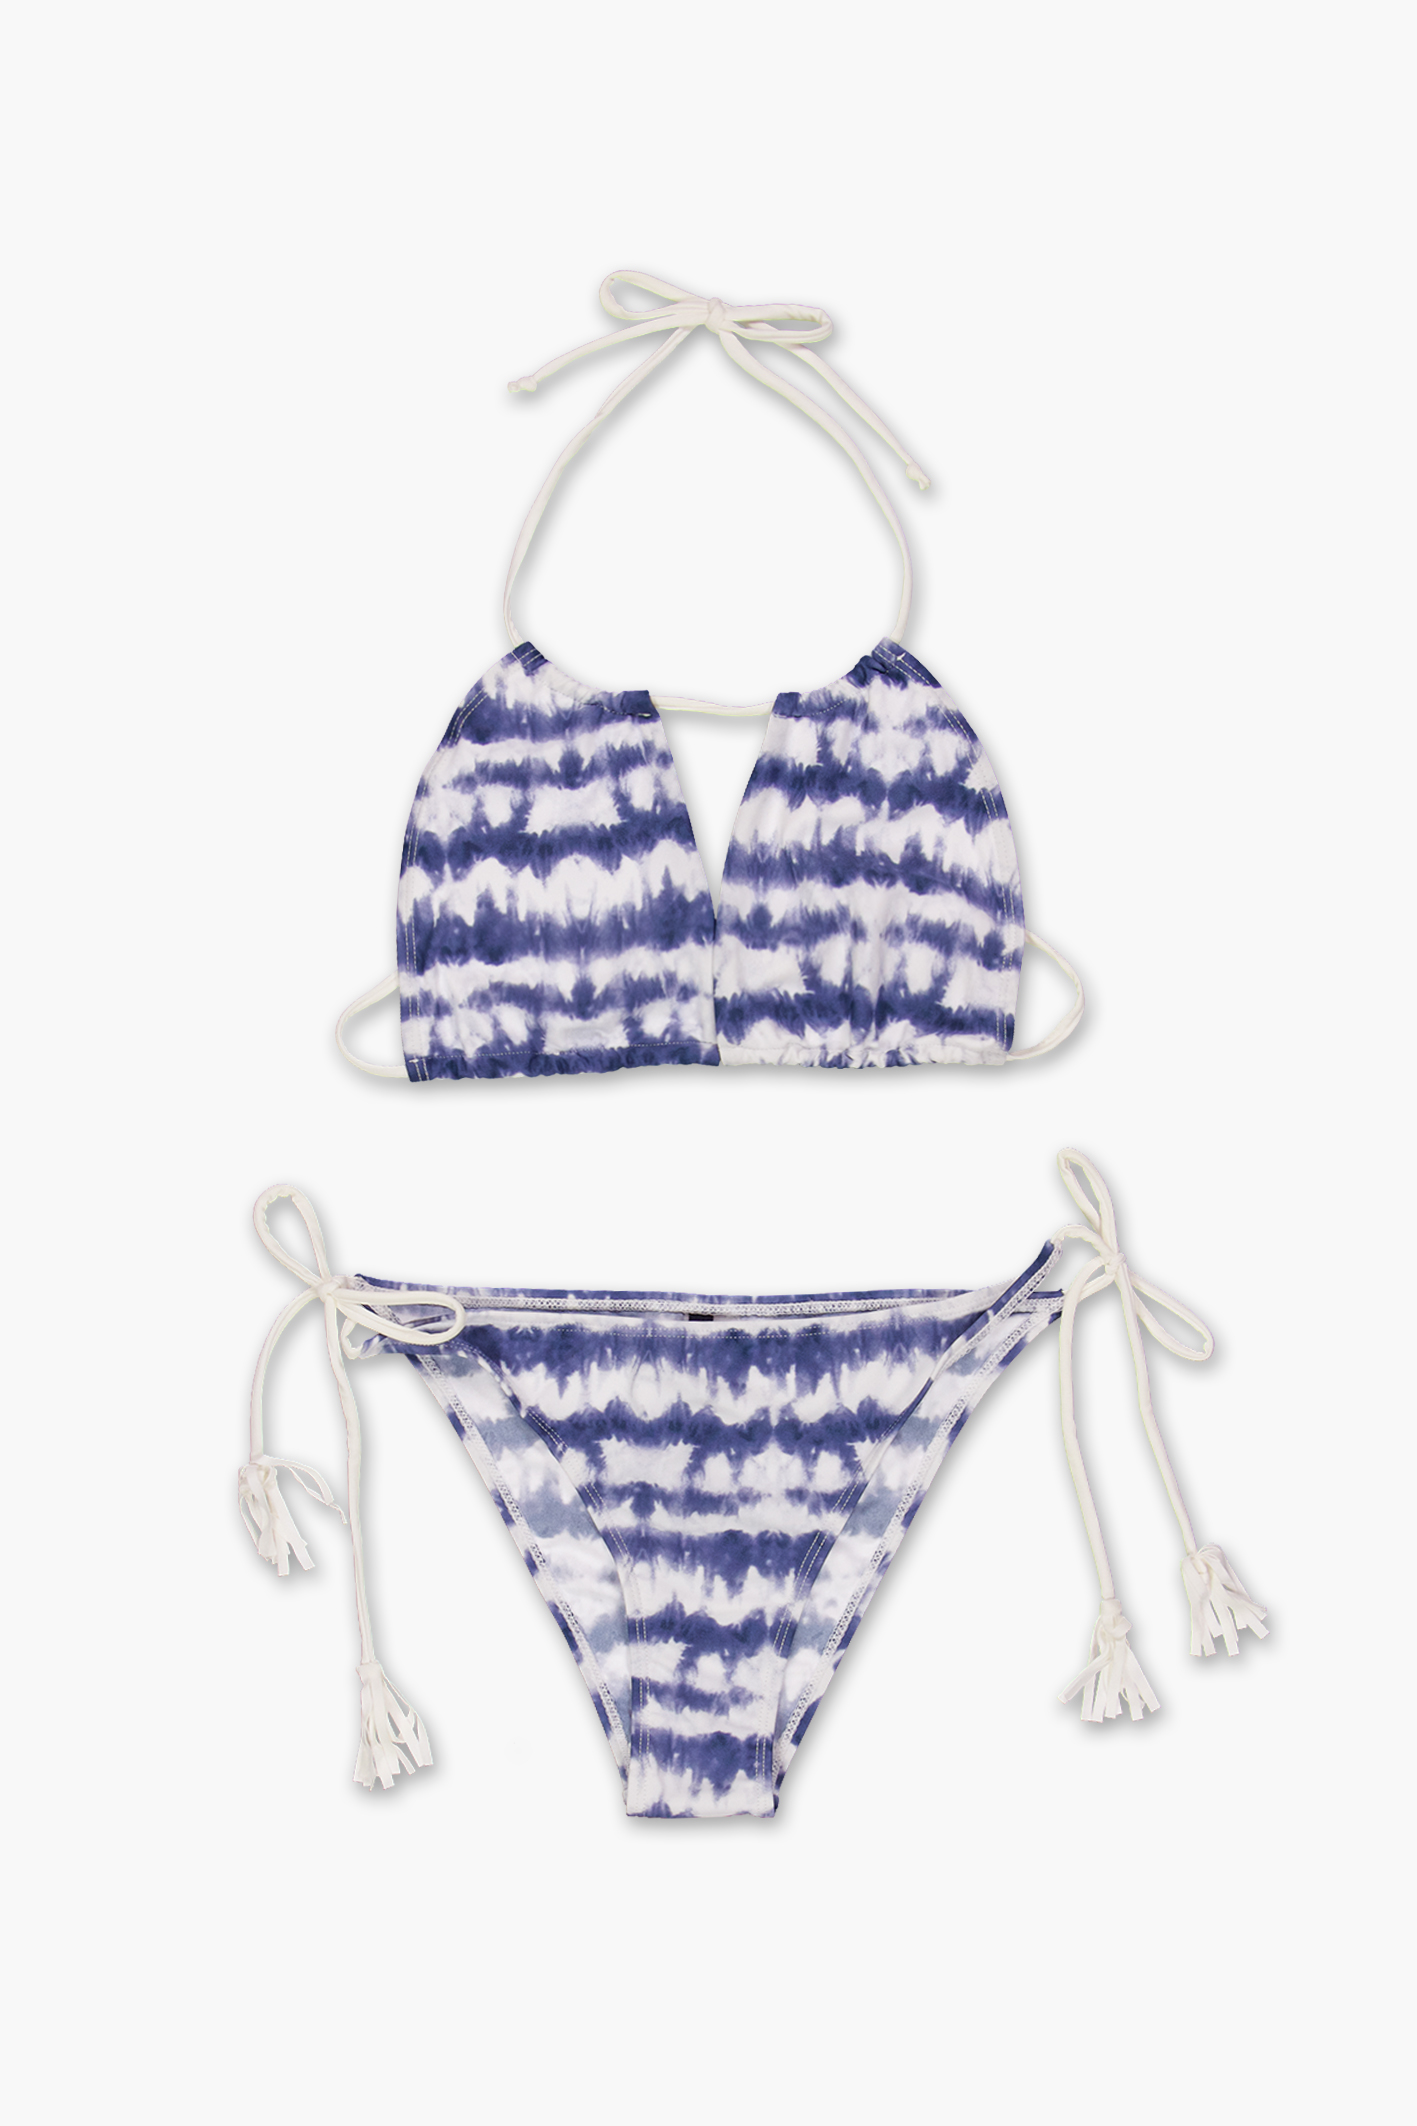 comoquieres_bikini-stp-venecia-0-3_13-27-2020__picture-12017